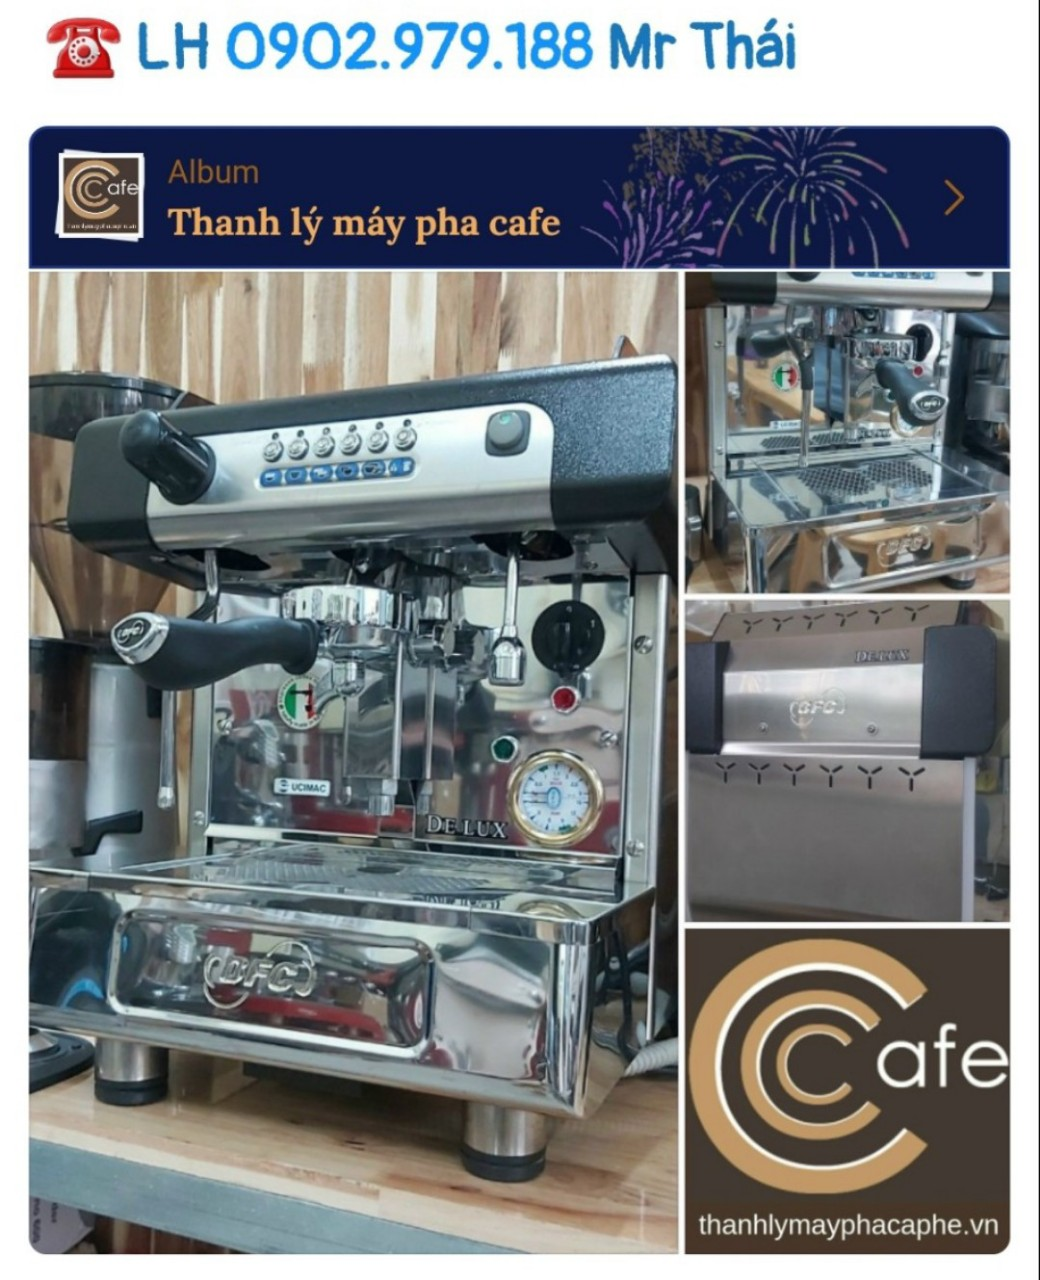 Máy pha cafe espresso thanh lý BFC Delux 1 group nhập khẩu Ý.